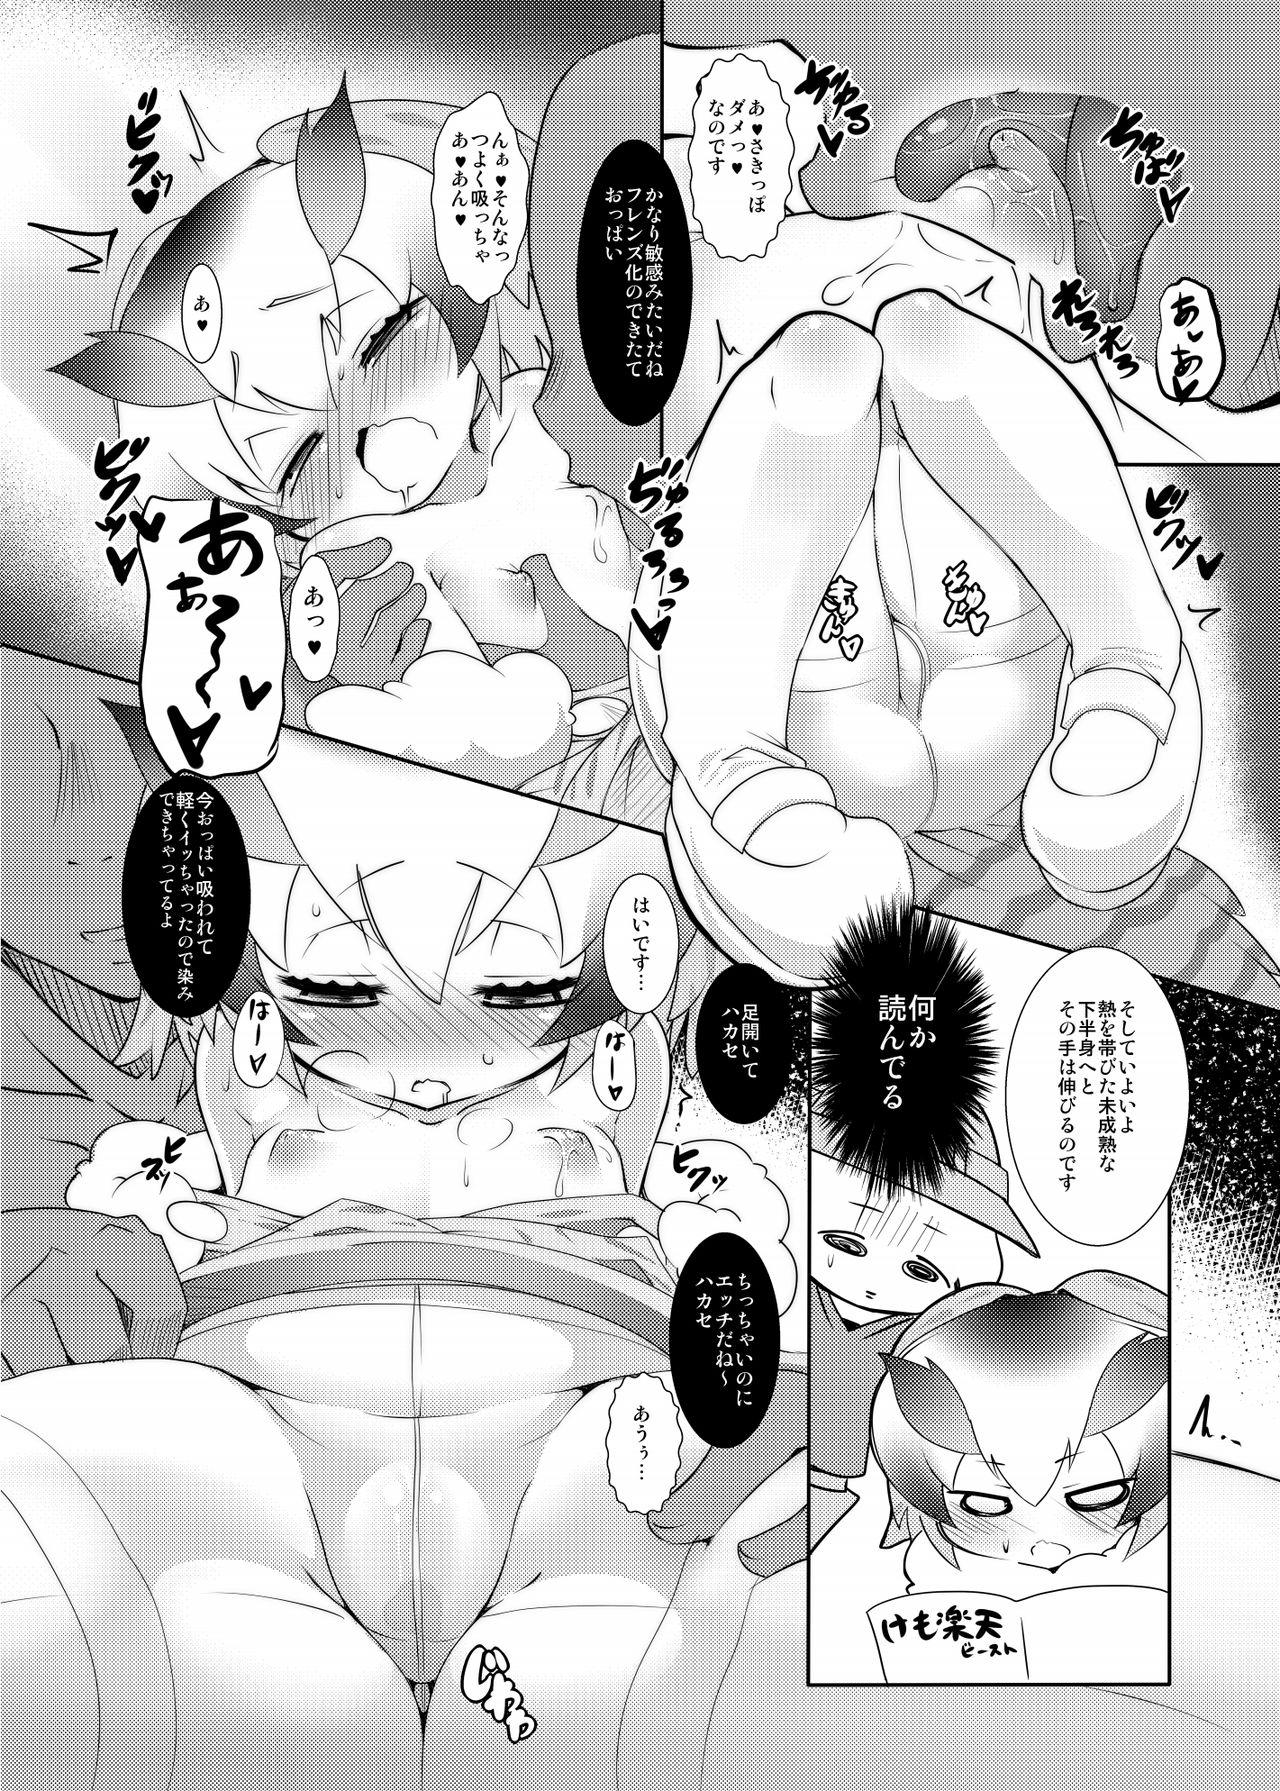 Hakase no How to Hanshoku 9